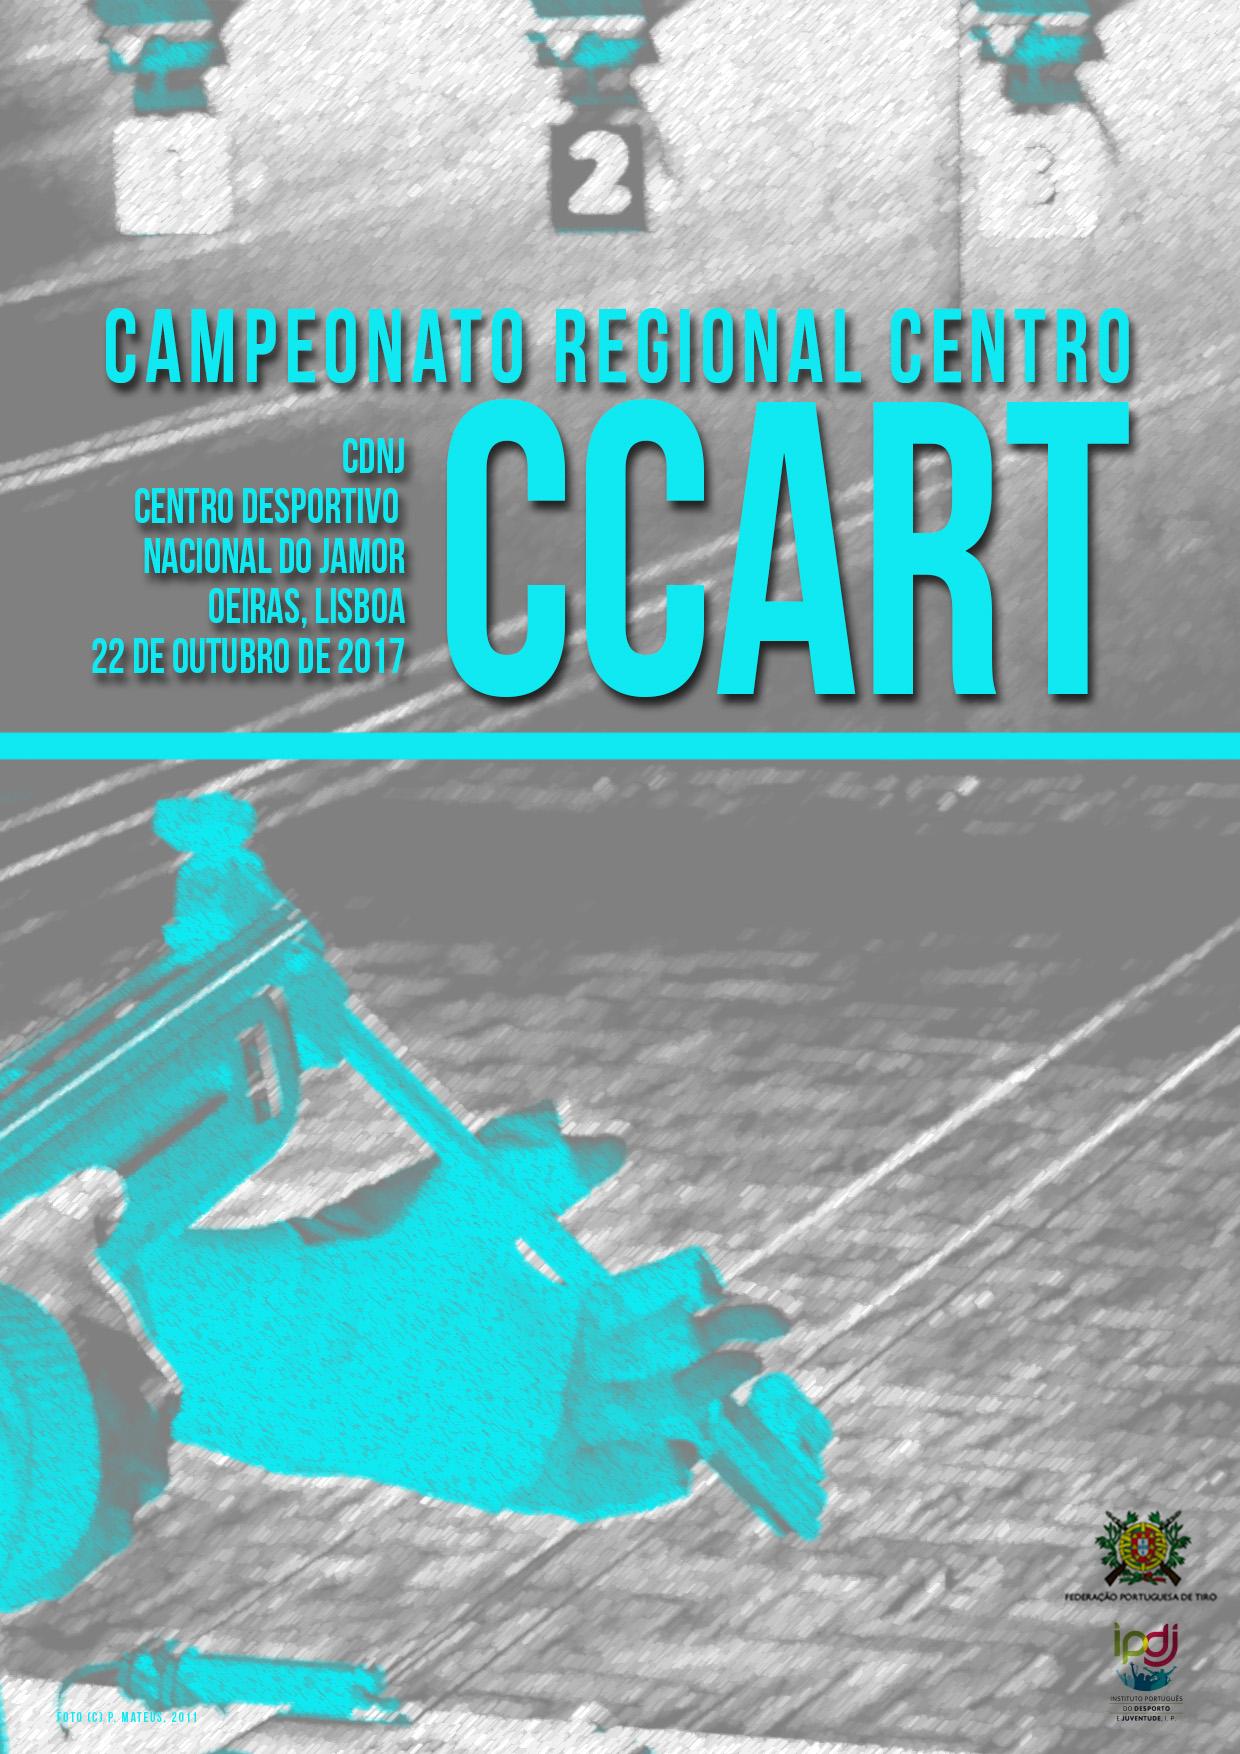 Campeonato Regional Centro CCArt 2017